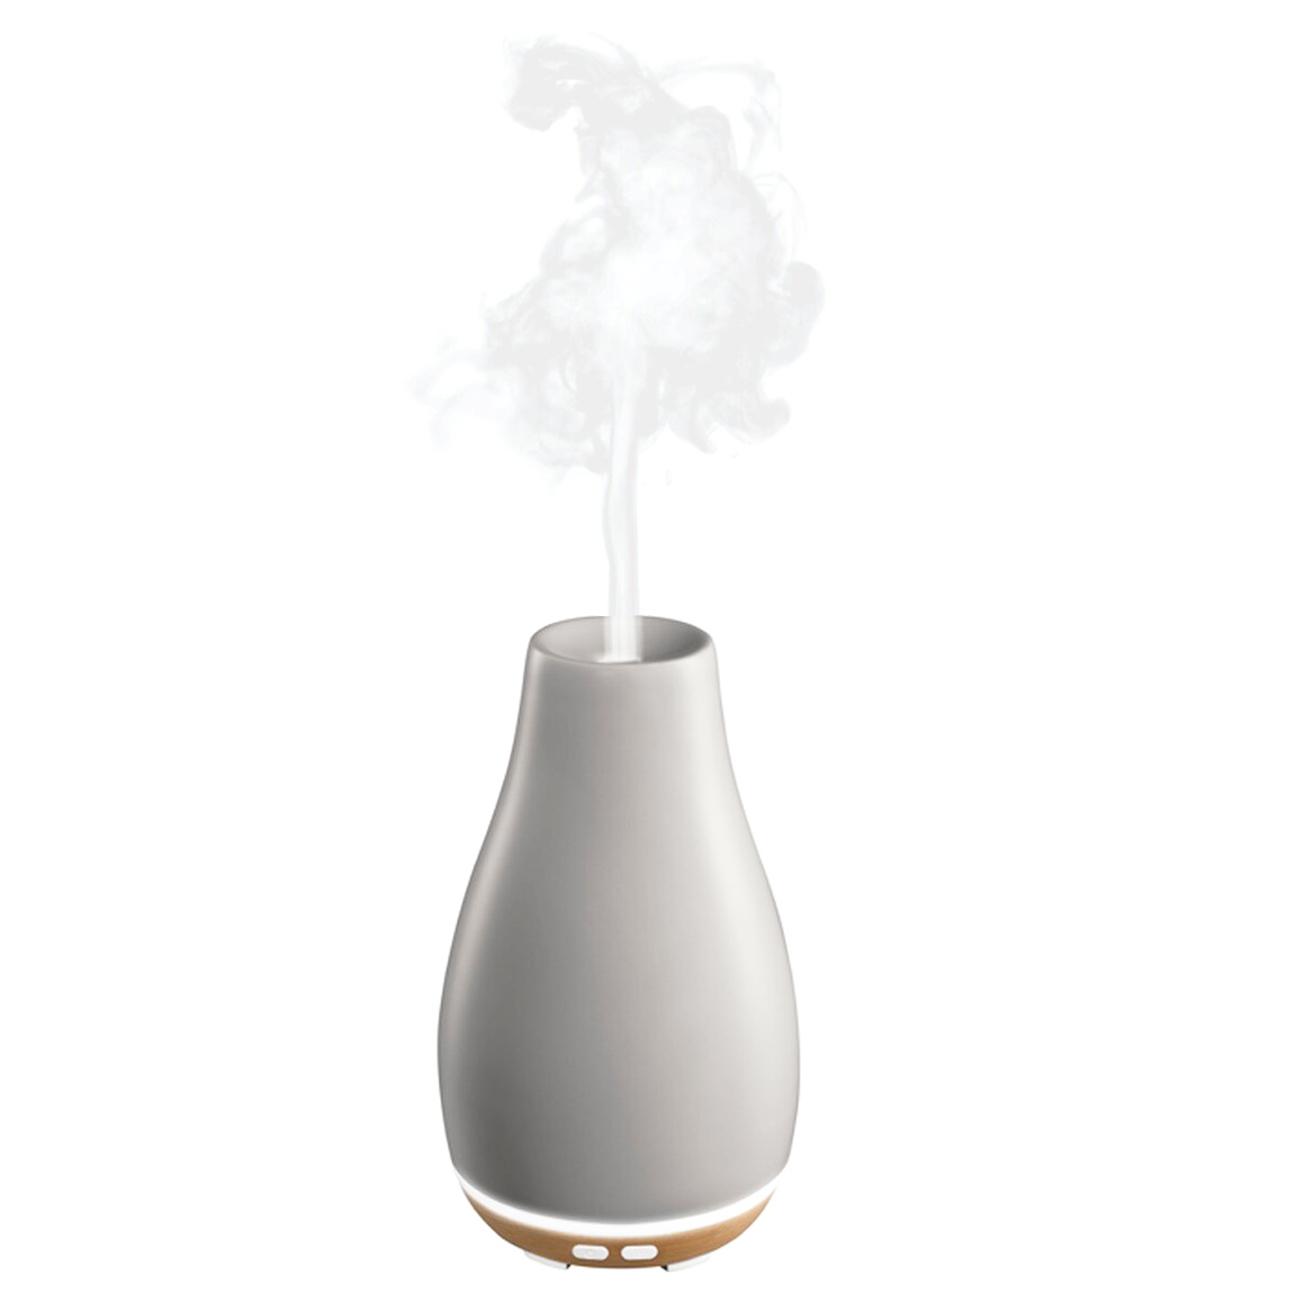 Difusor de aromas e umidificador ultrassônico Ellia 130ml  - BRIGHT